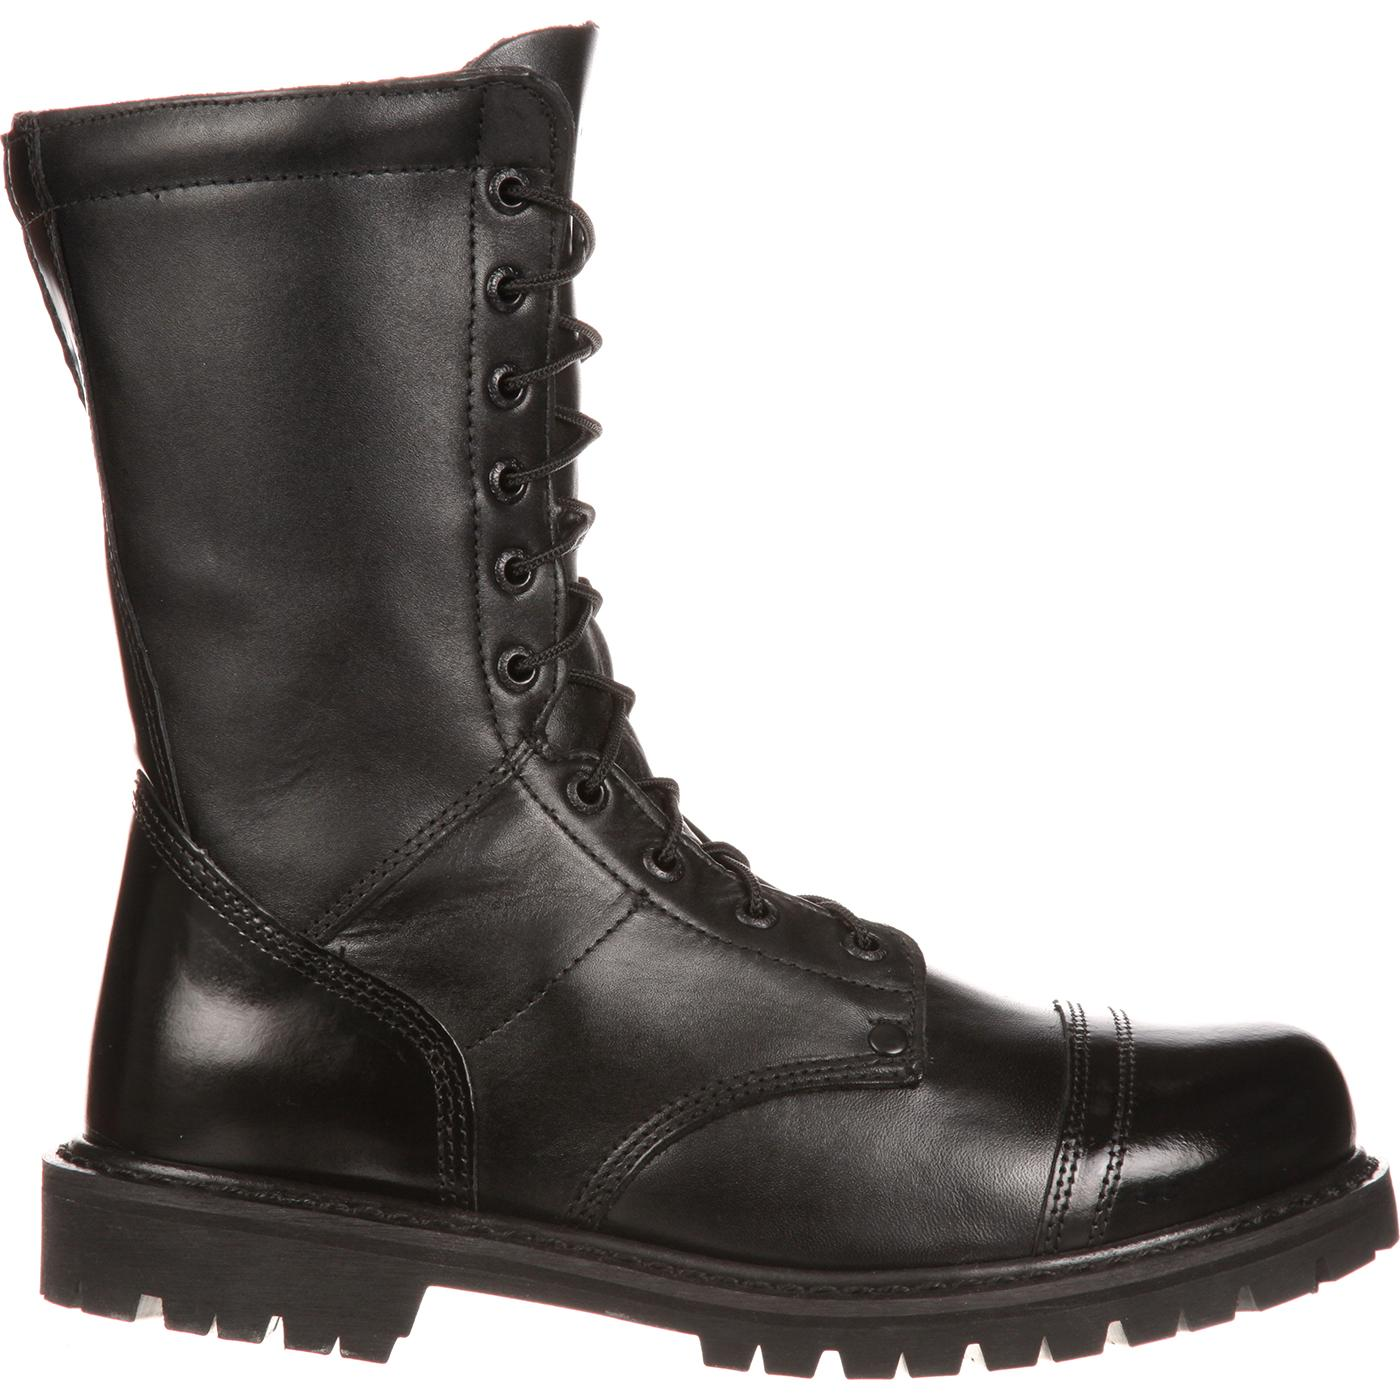 Rocky Duty Boots - Men's Side Zipper Paratrooper Boots